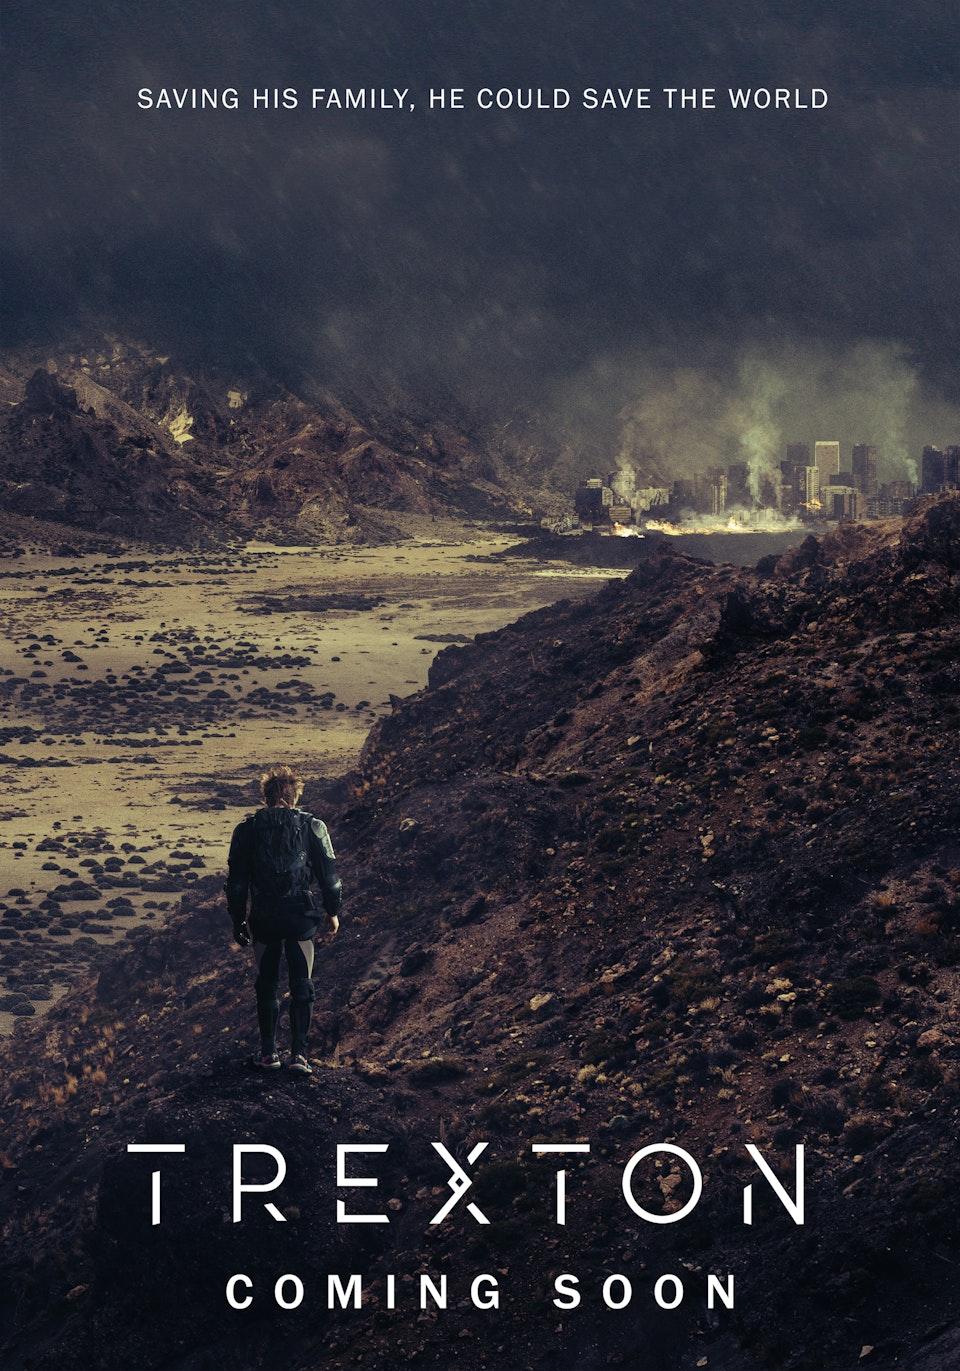 Trexton / Proof of Concept - Director_Kobayashi_Trexton_Poster_02